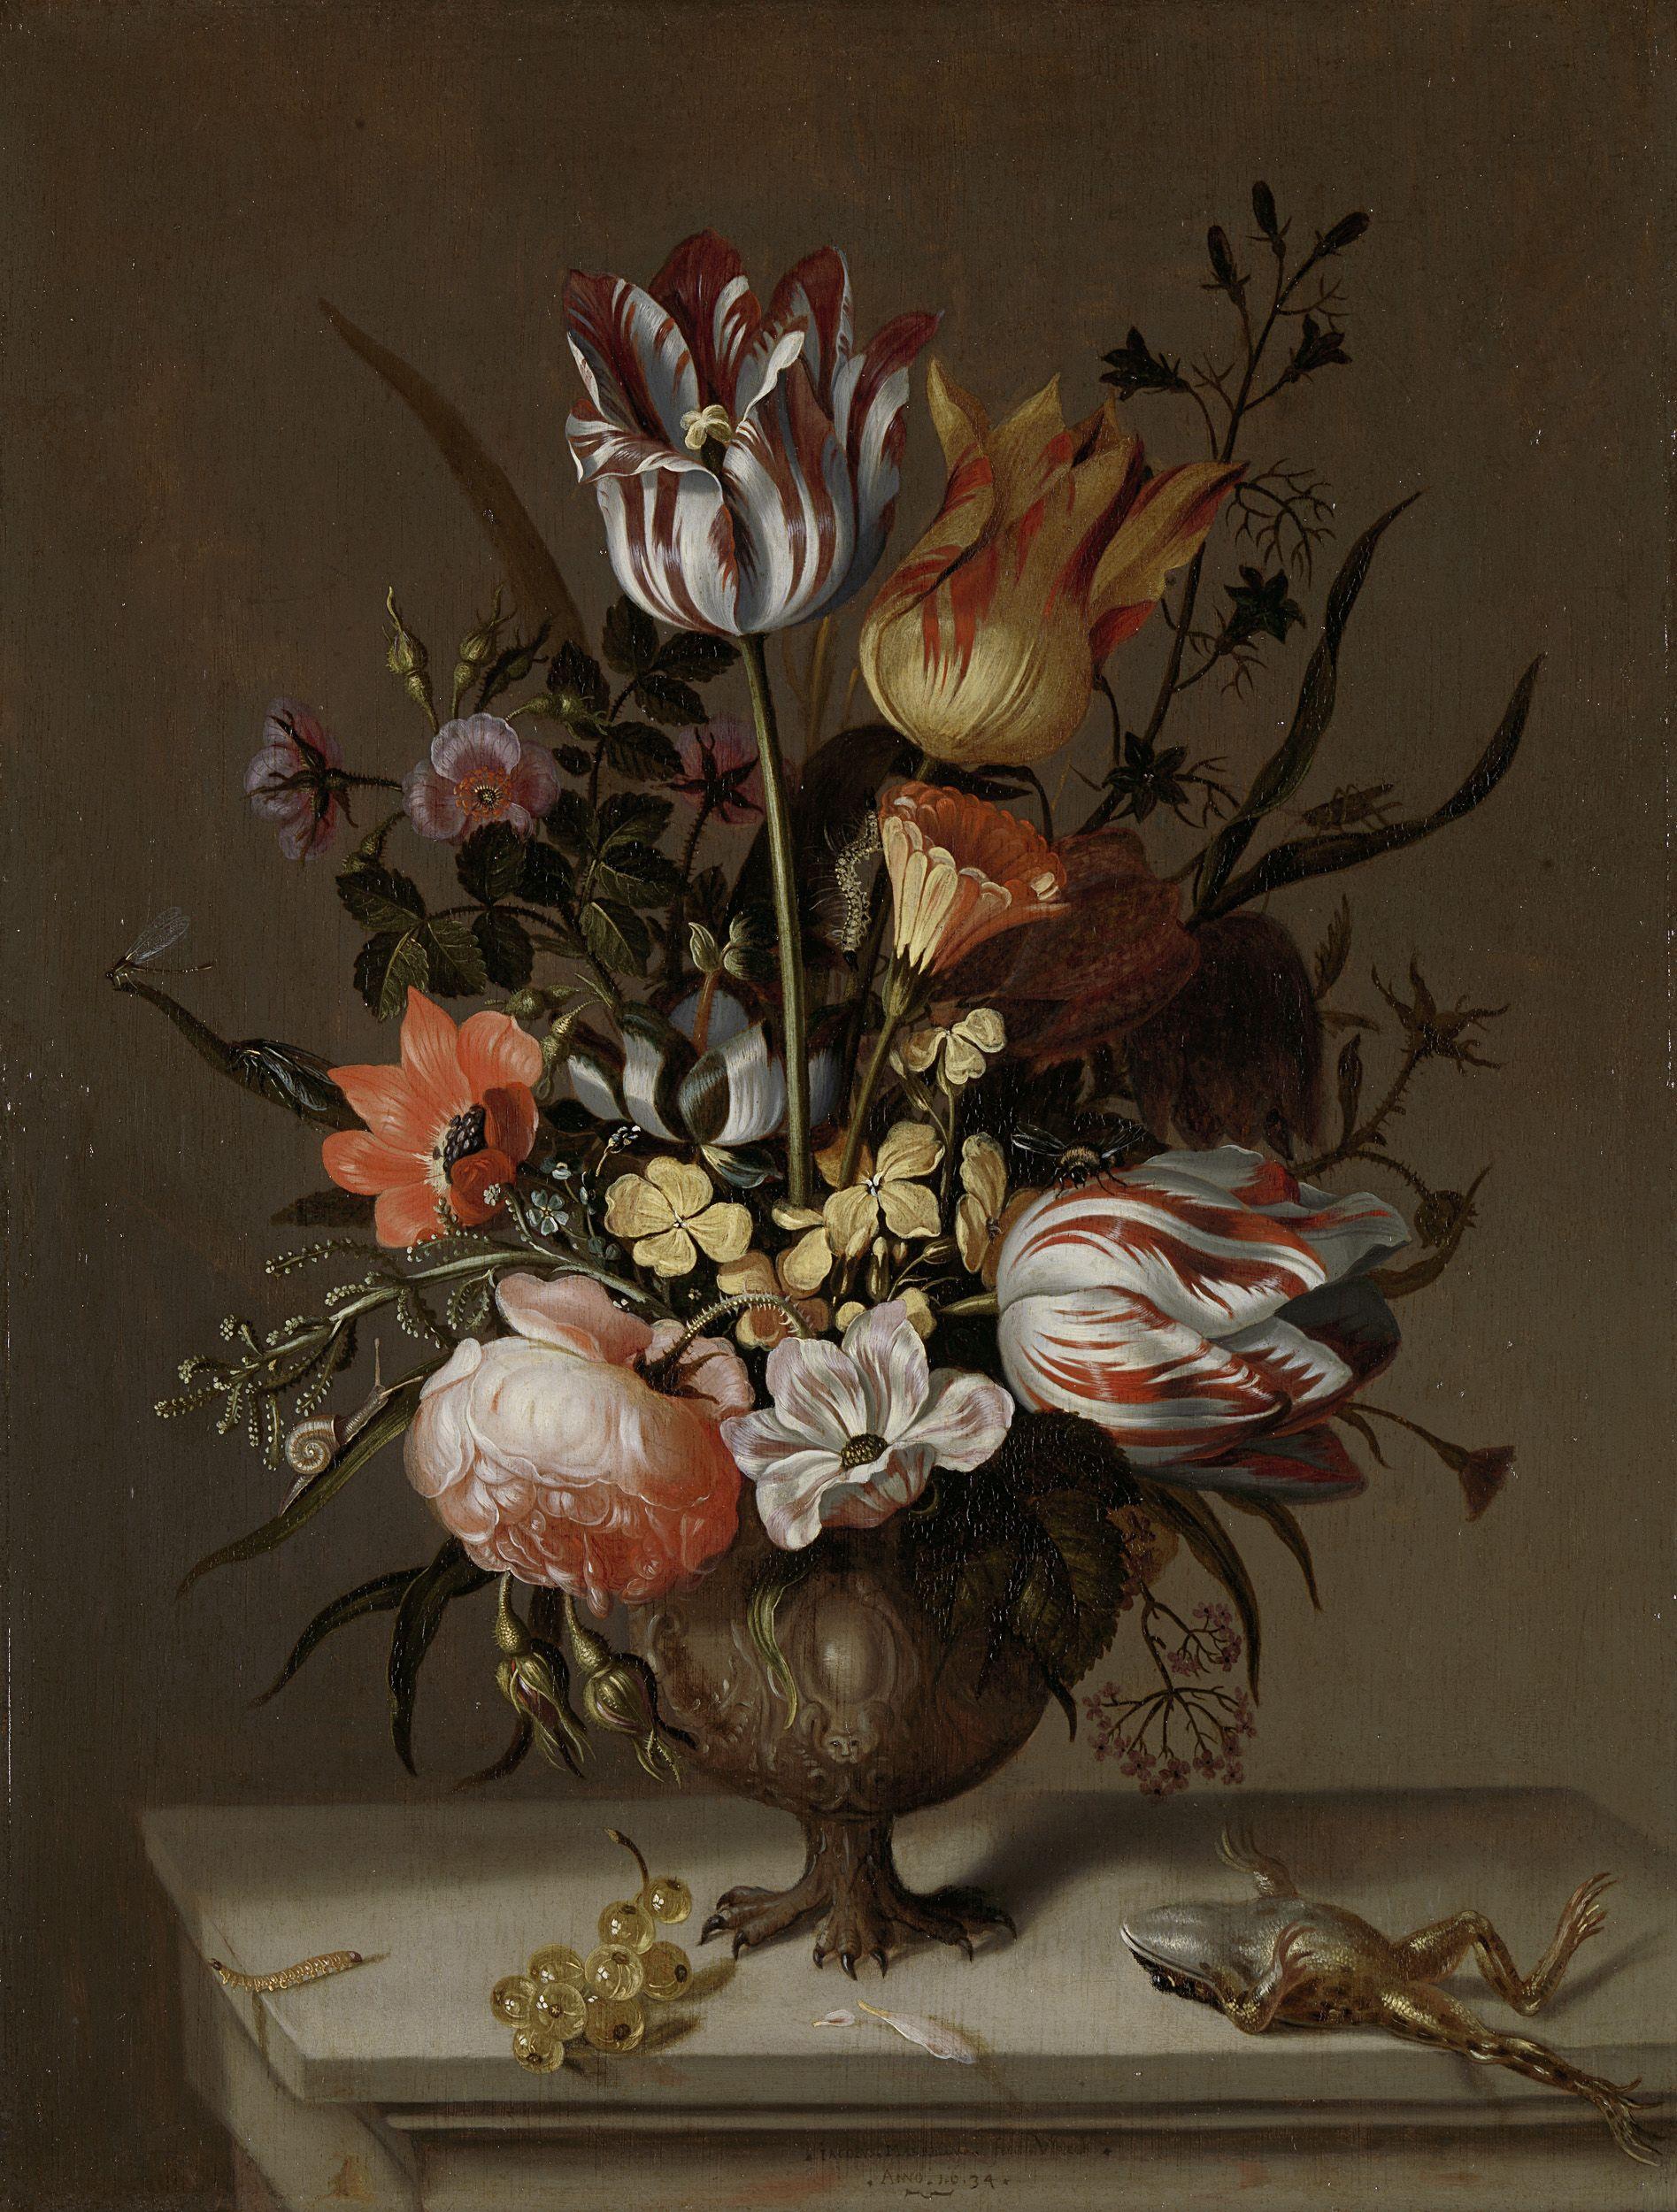 Kptallat a kvetkezre still life with a vase of flowers and kptallat a kvetkezre still life with a vase of flowers and a dead reviewsmspy